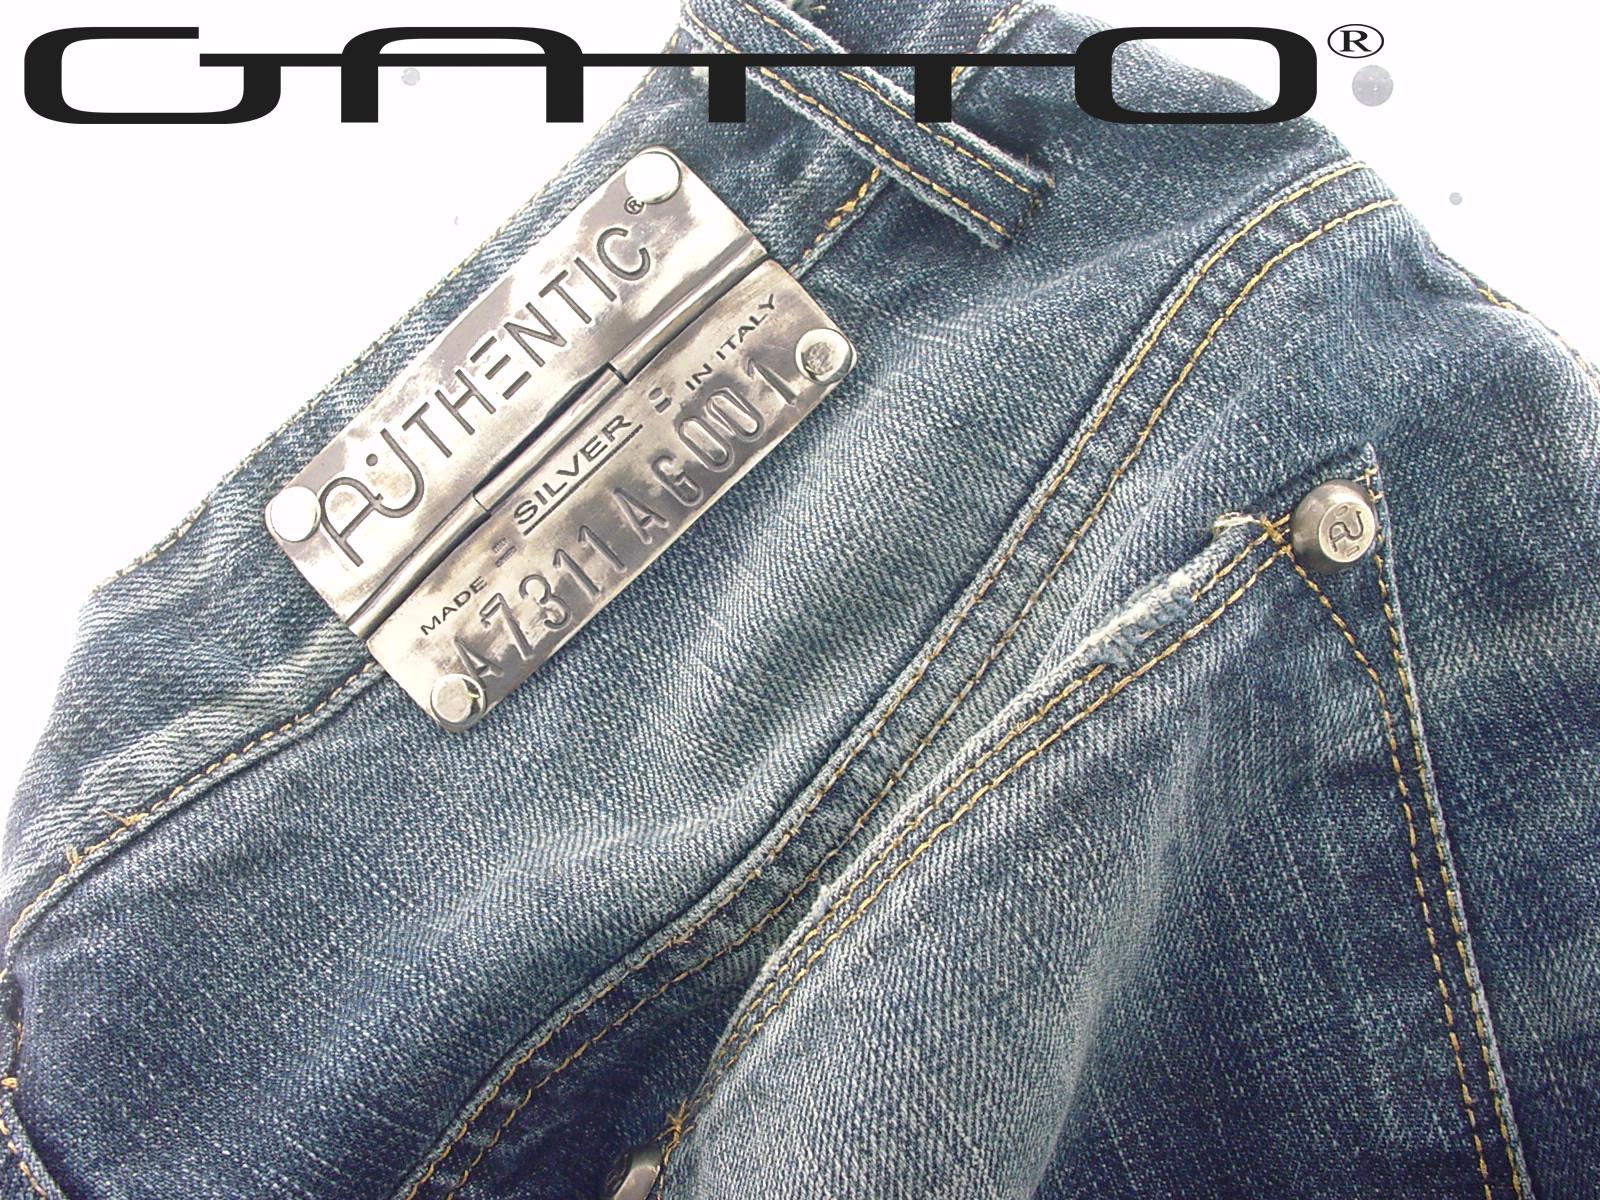 SALPA RIVETTO 01